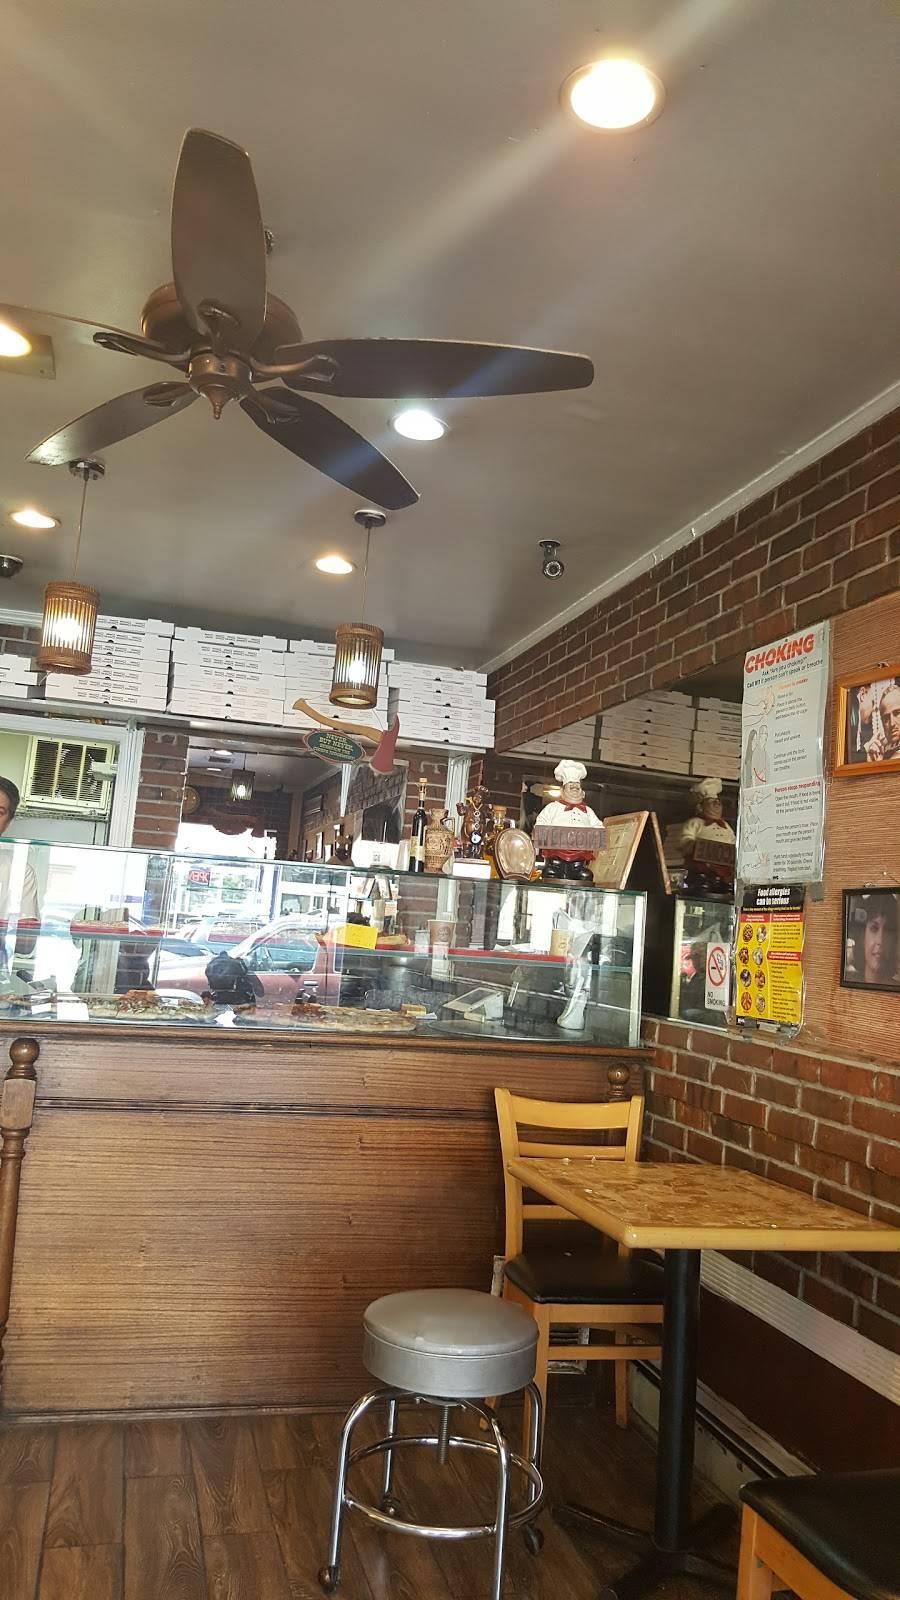 House Pizza | restaurant | 246 E 204th St, Bronx, NY 10458, USA | 7187333336 OR +1 718-733-3336